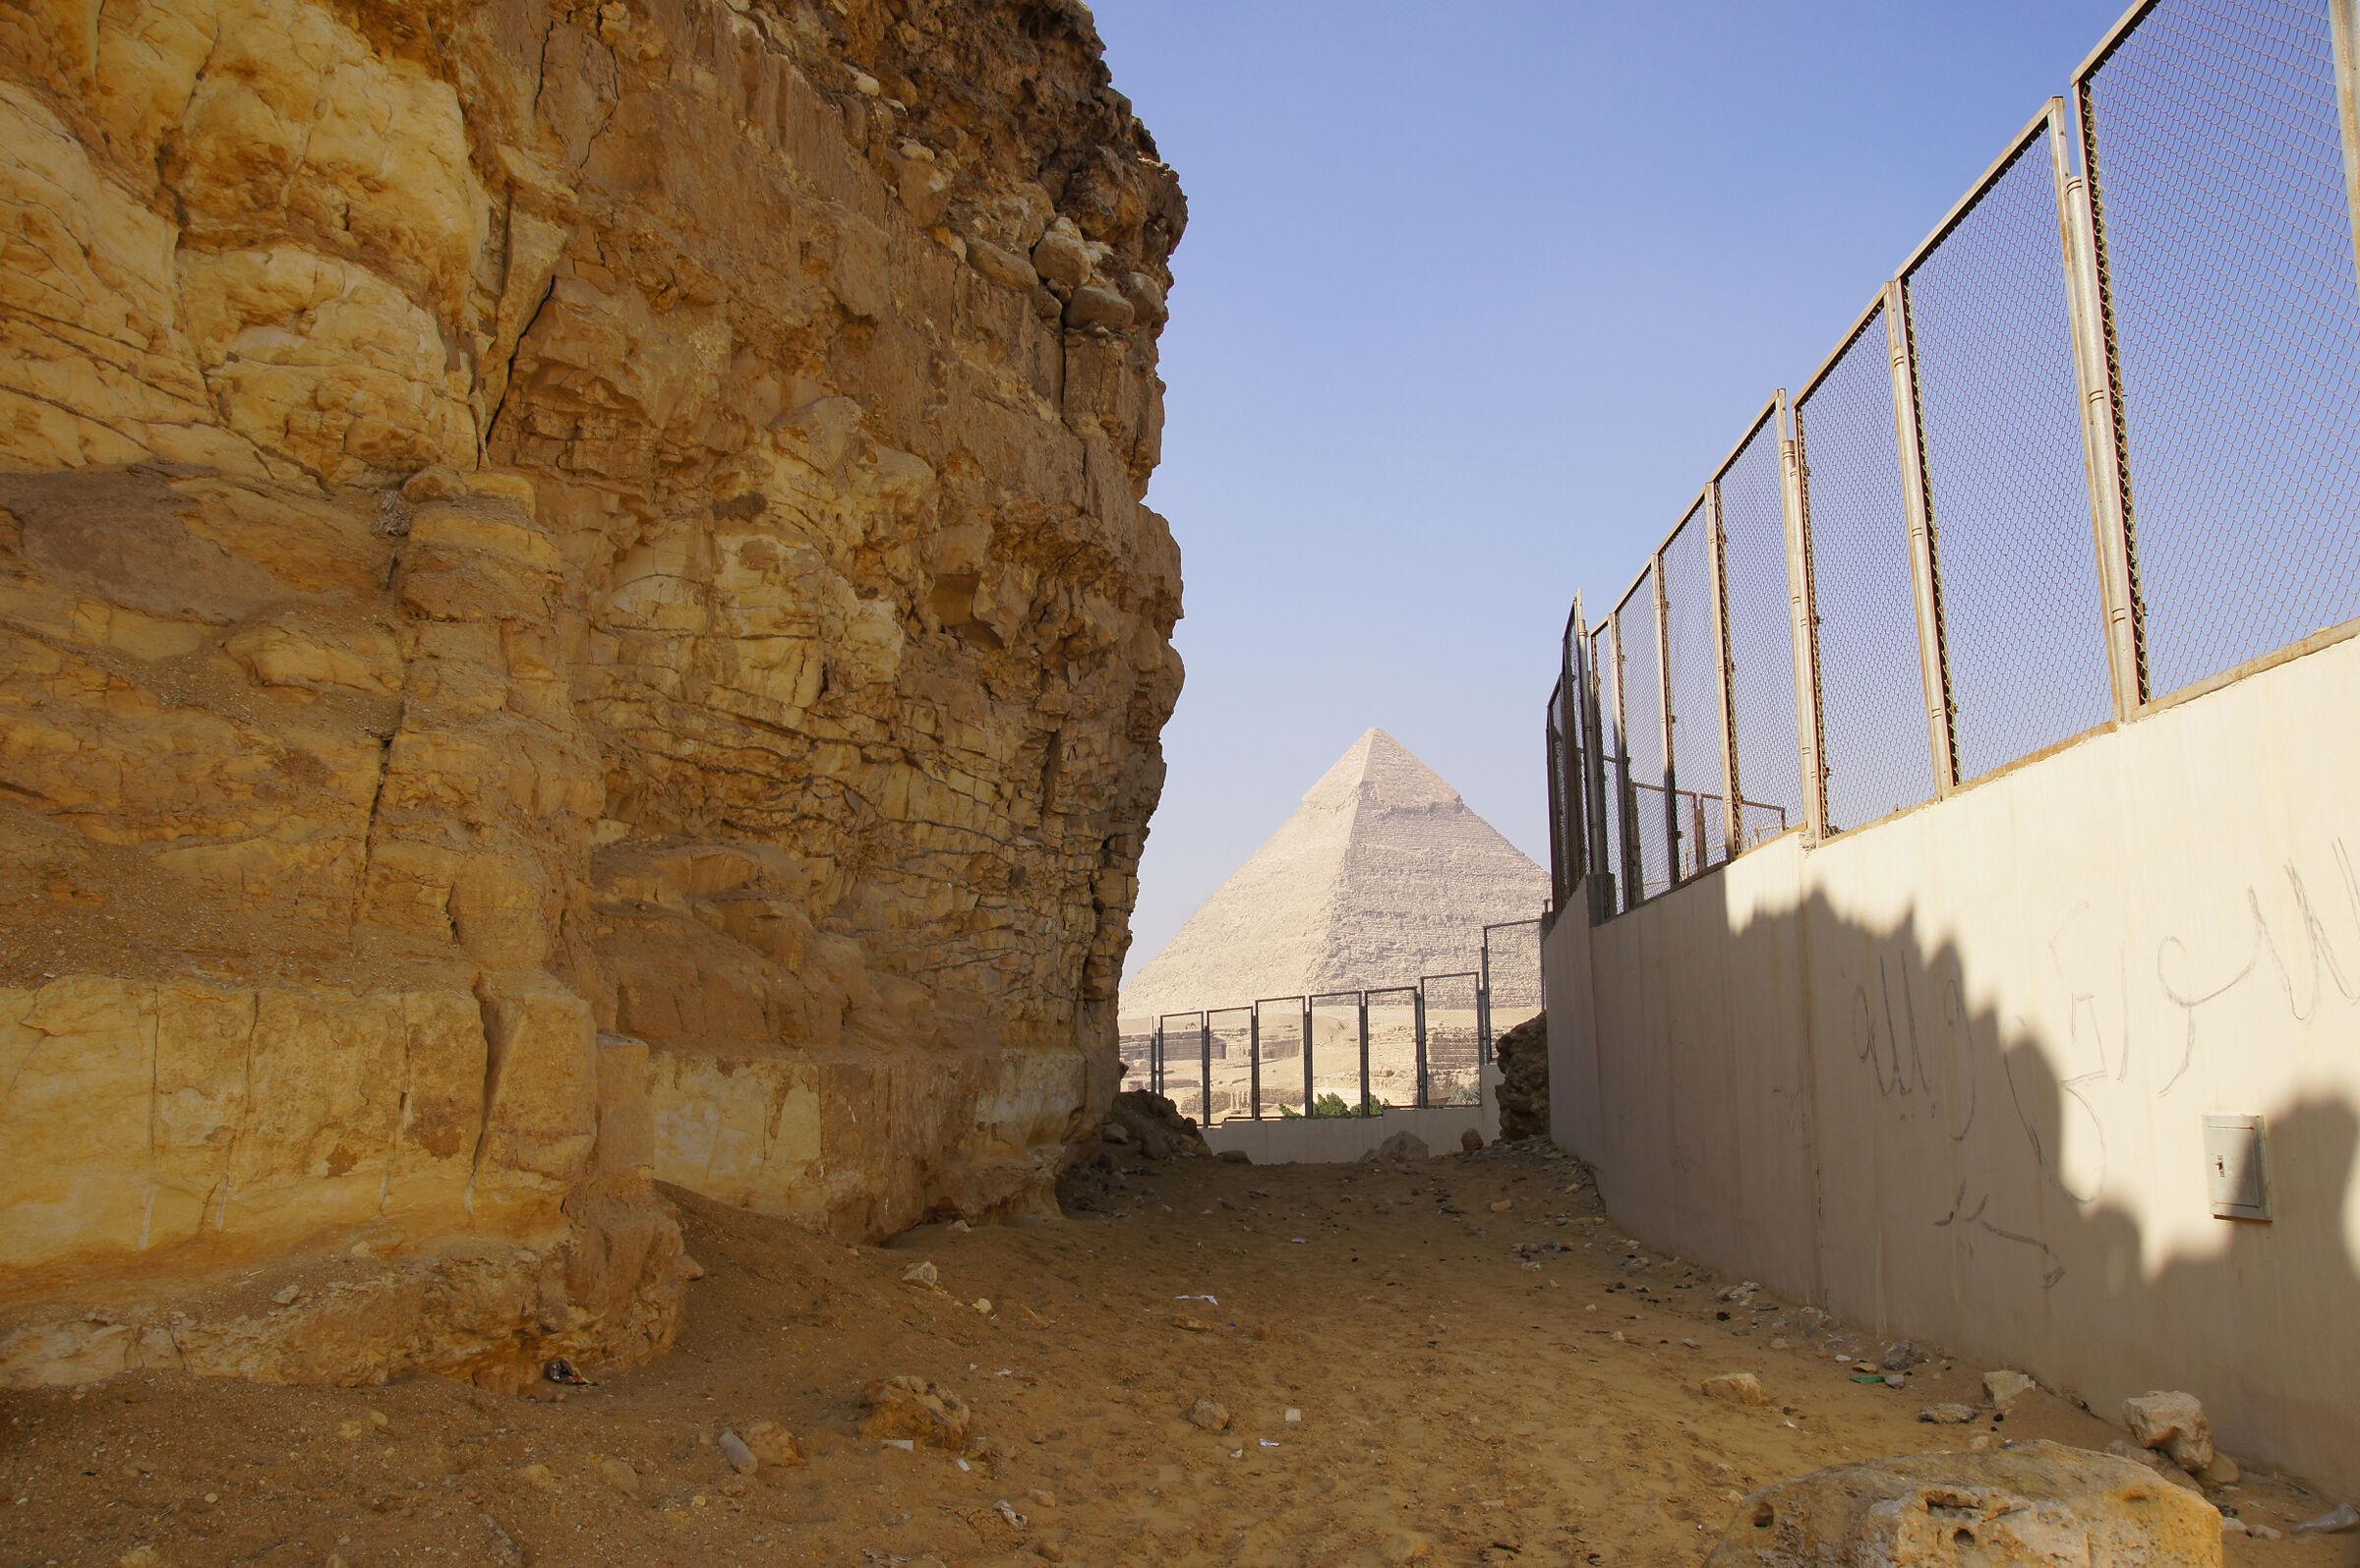 South Giza: Site: Giza; View: Southern Mount, Muslim Cemetery, Khafre Pyramid